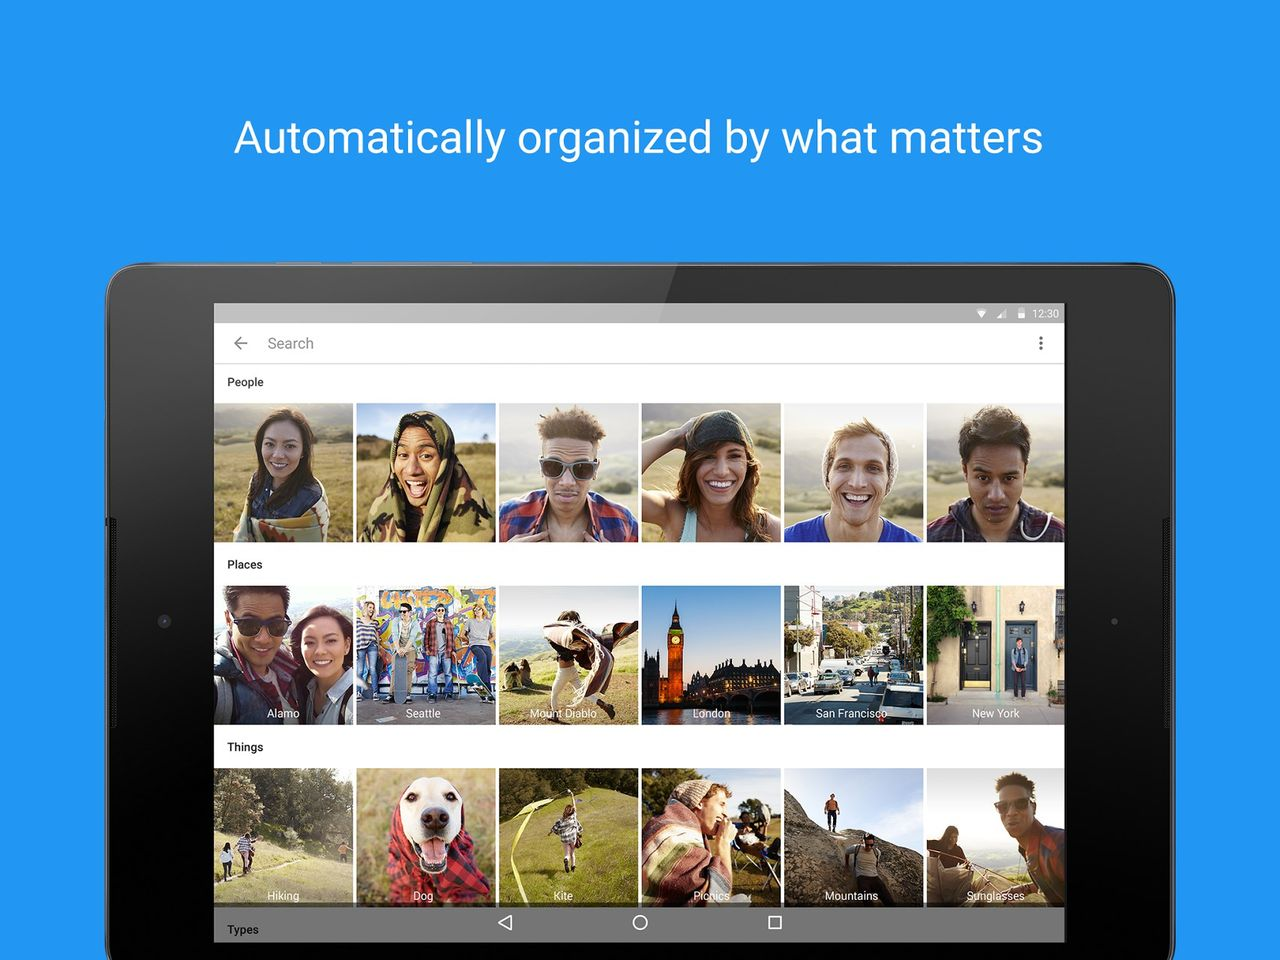 Dela filmer via Google Photos trots dålig uppkoppling